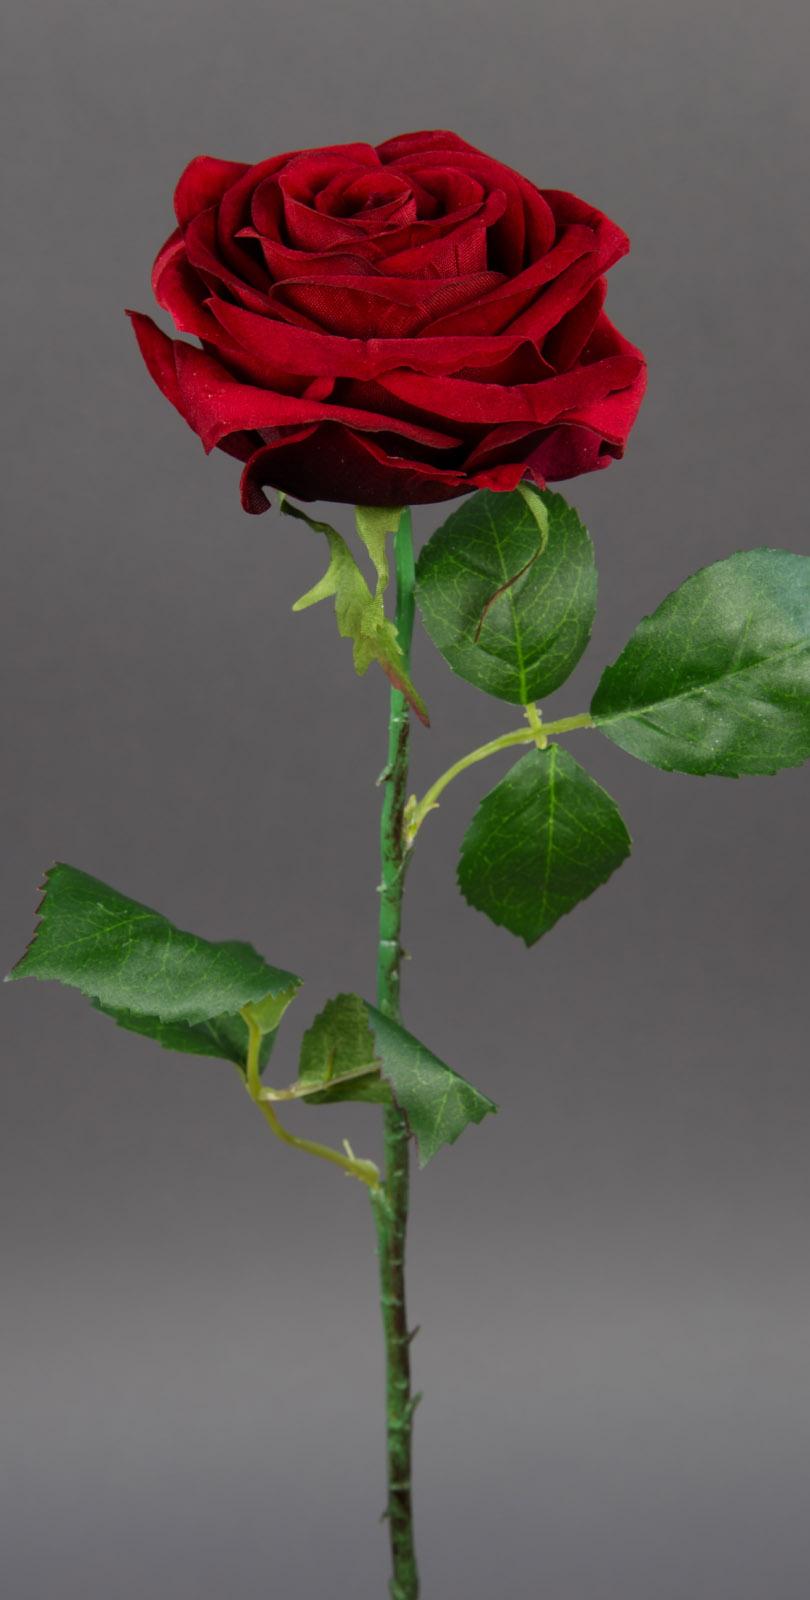 baccararose 54cm rot cg kunstblumen seidenblumen k nstliche blumen baccara rose ebay. Black Bedroom Furniture Sets. Home Design Ideas